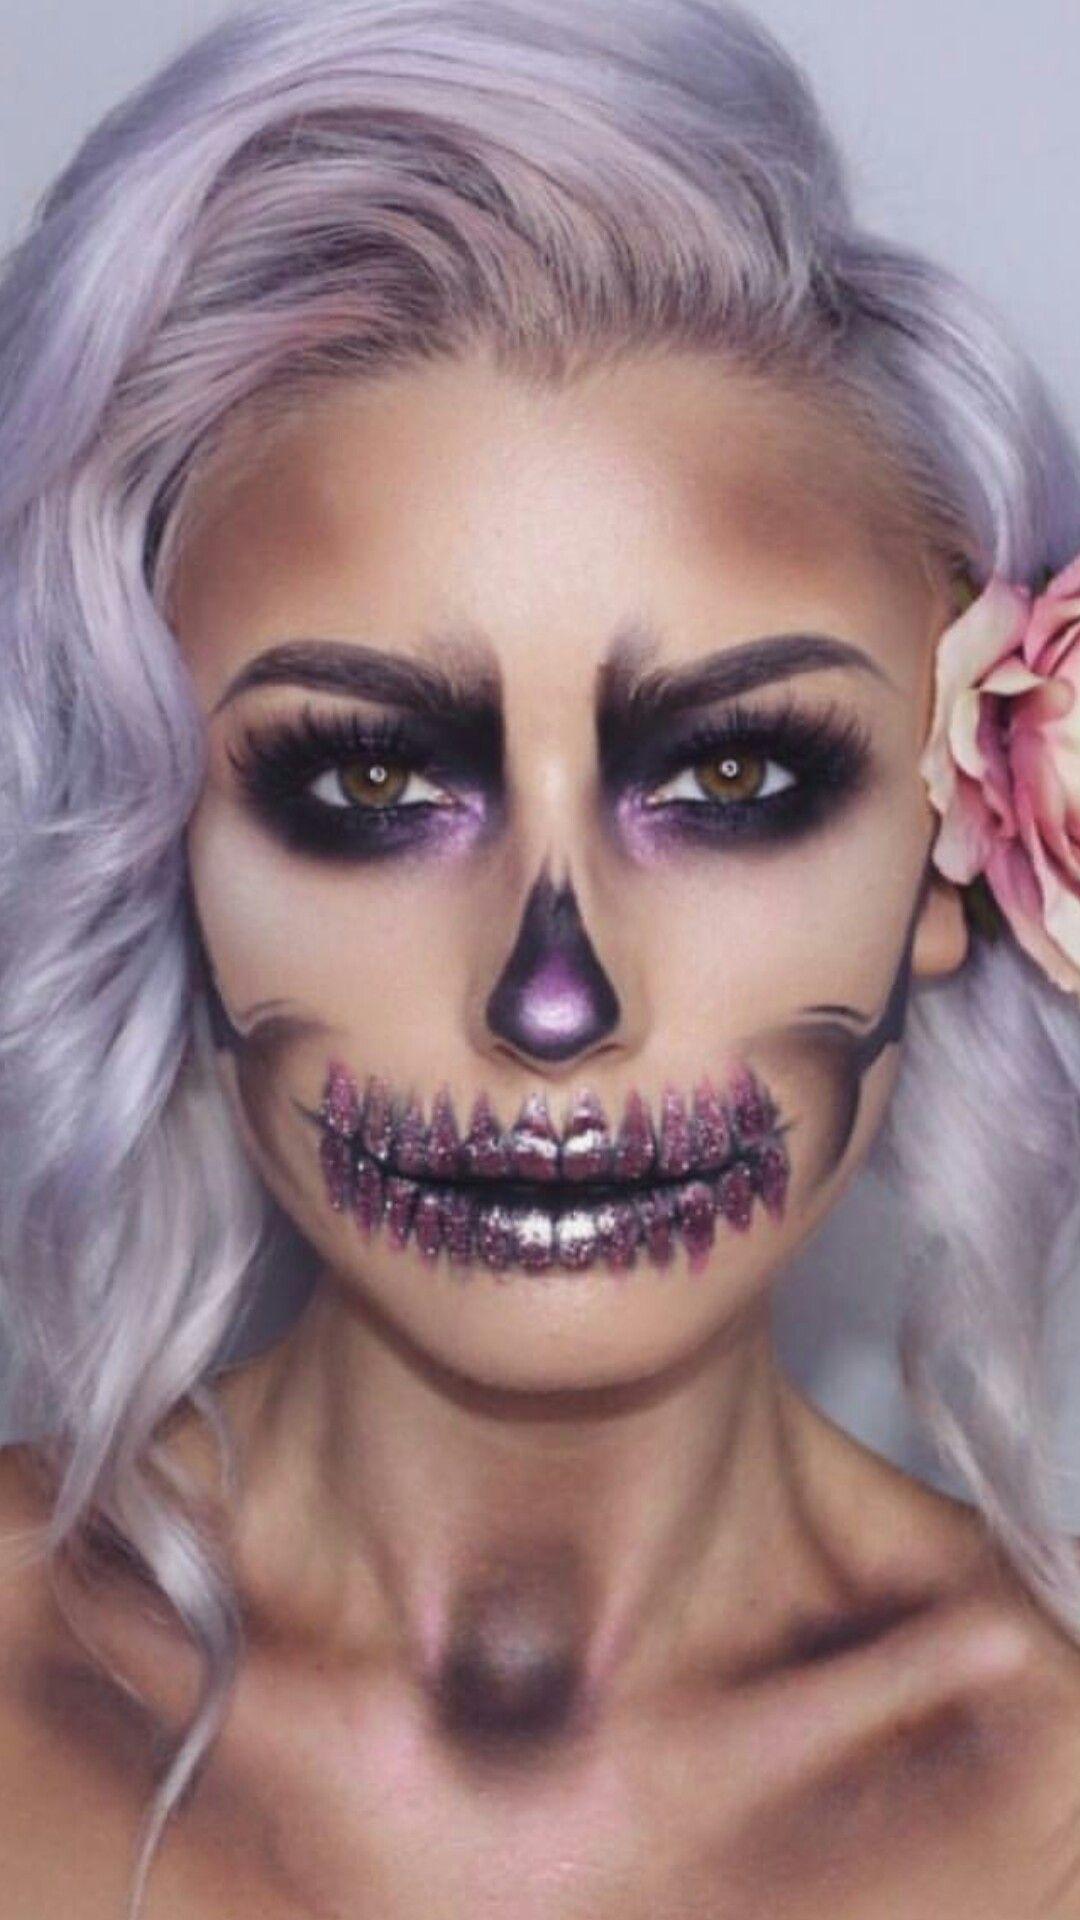 Beautiful halloween makeup by Abbie Jackson on Halloween